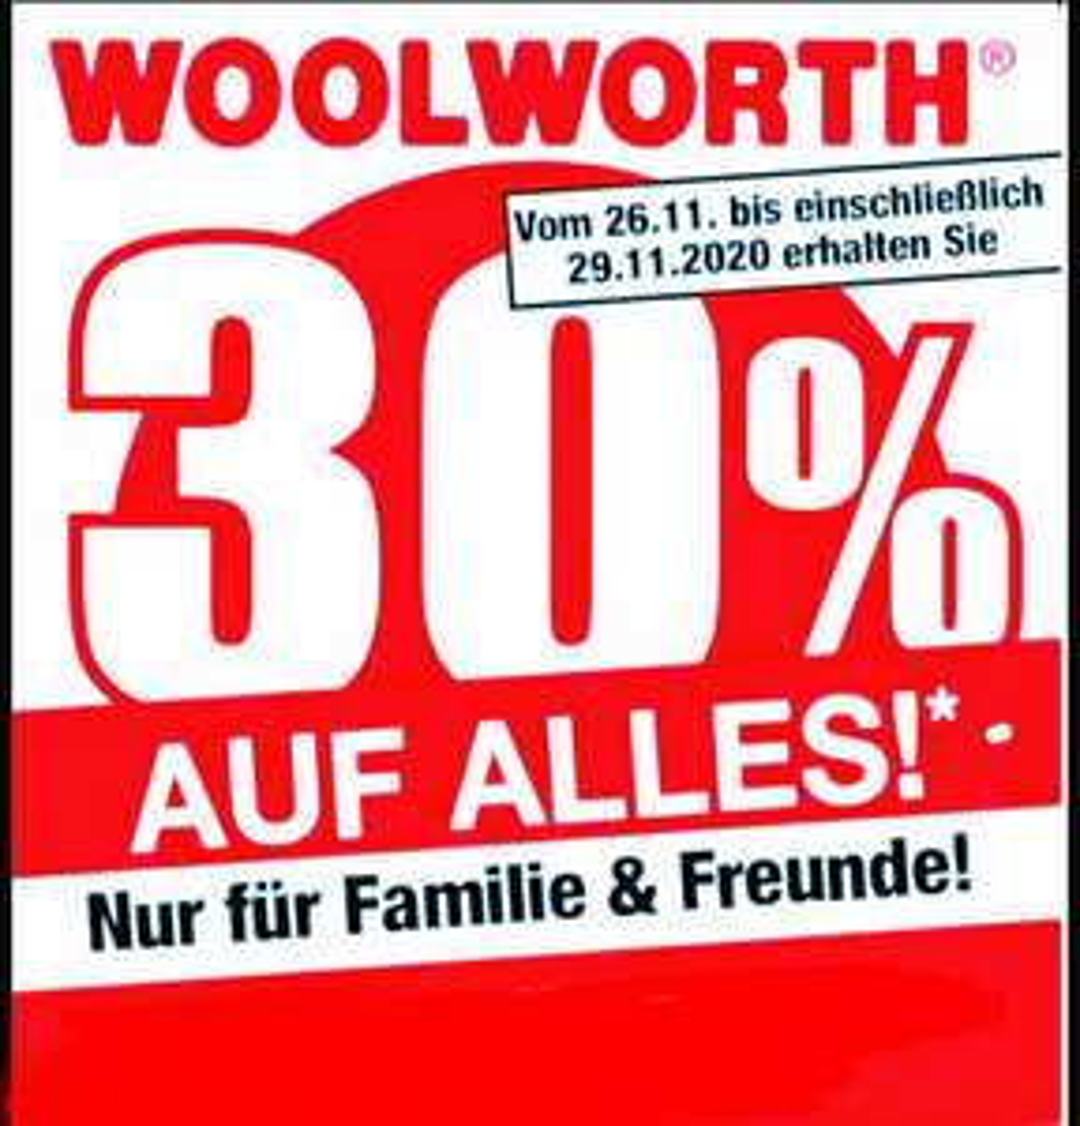 [Woolworth] 30% auf gesamtes Sortiment